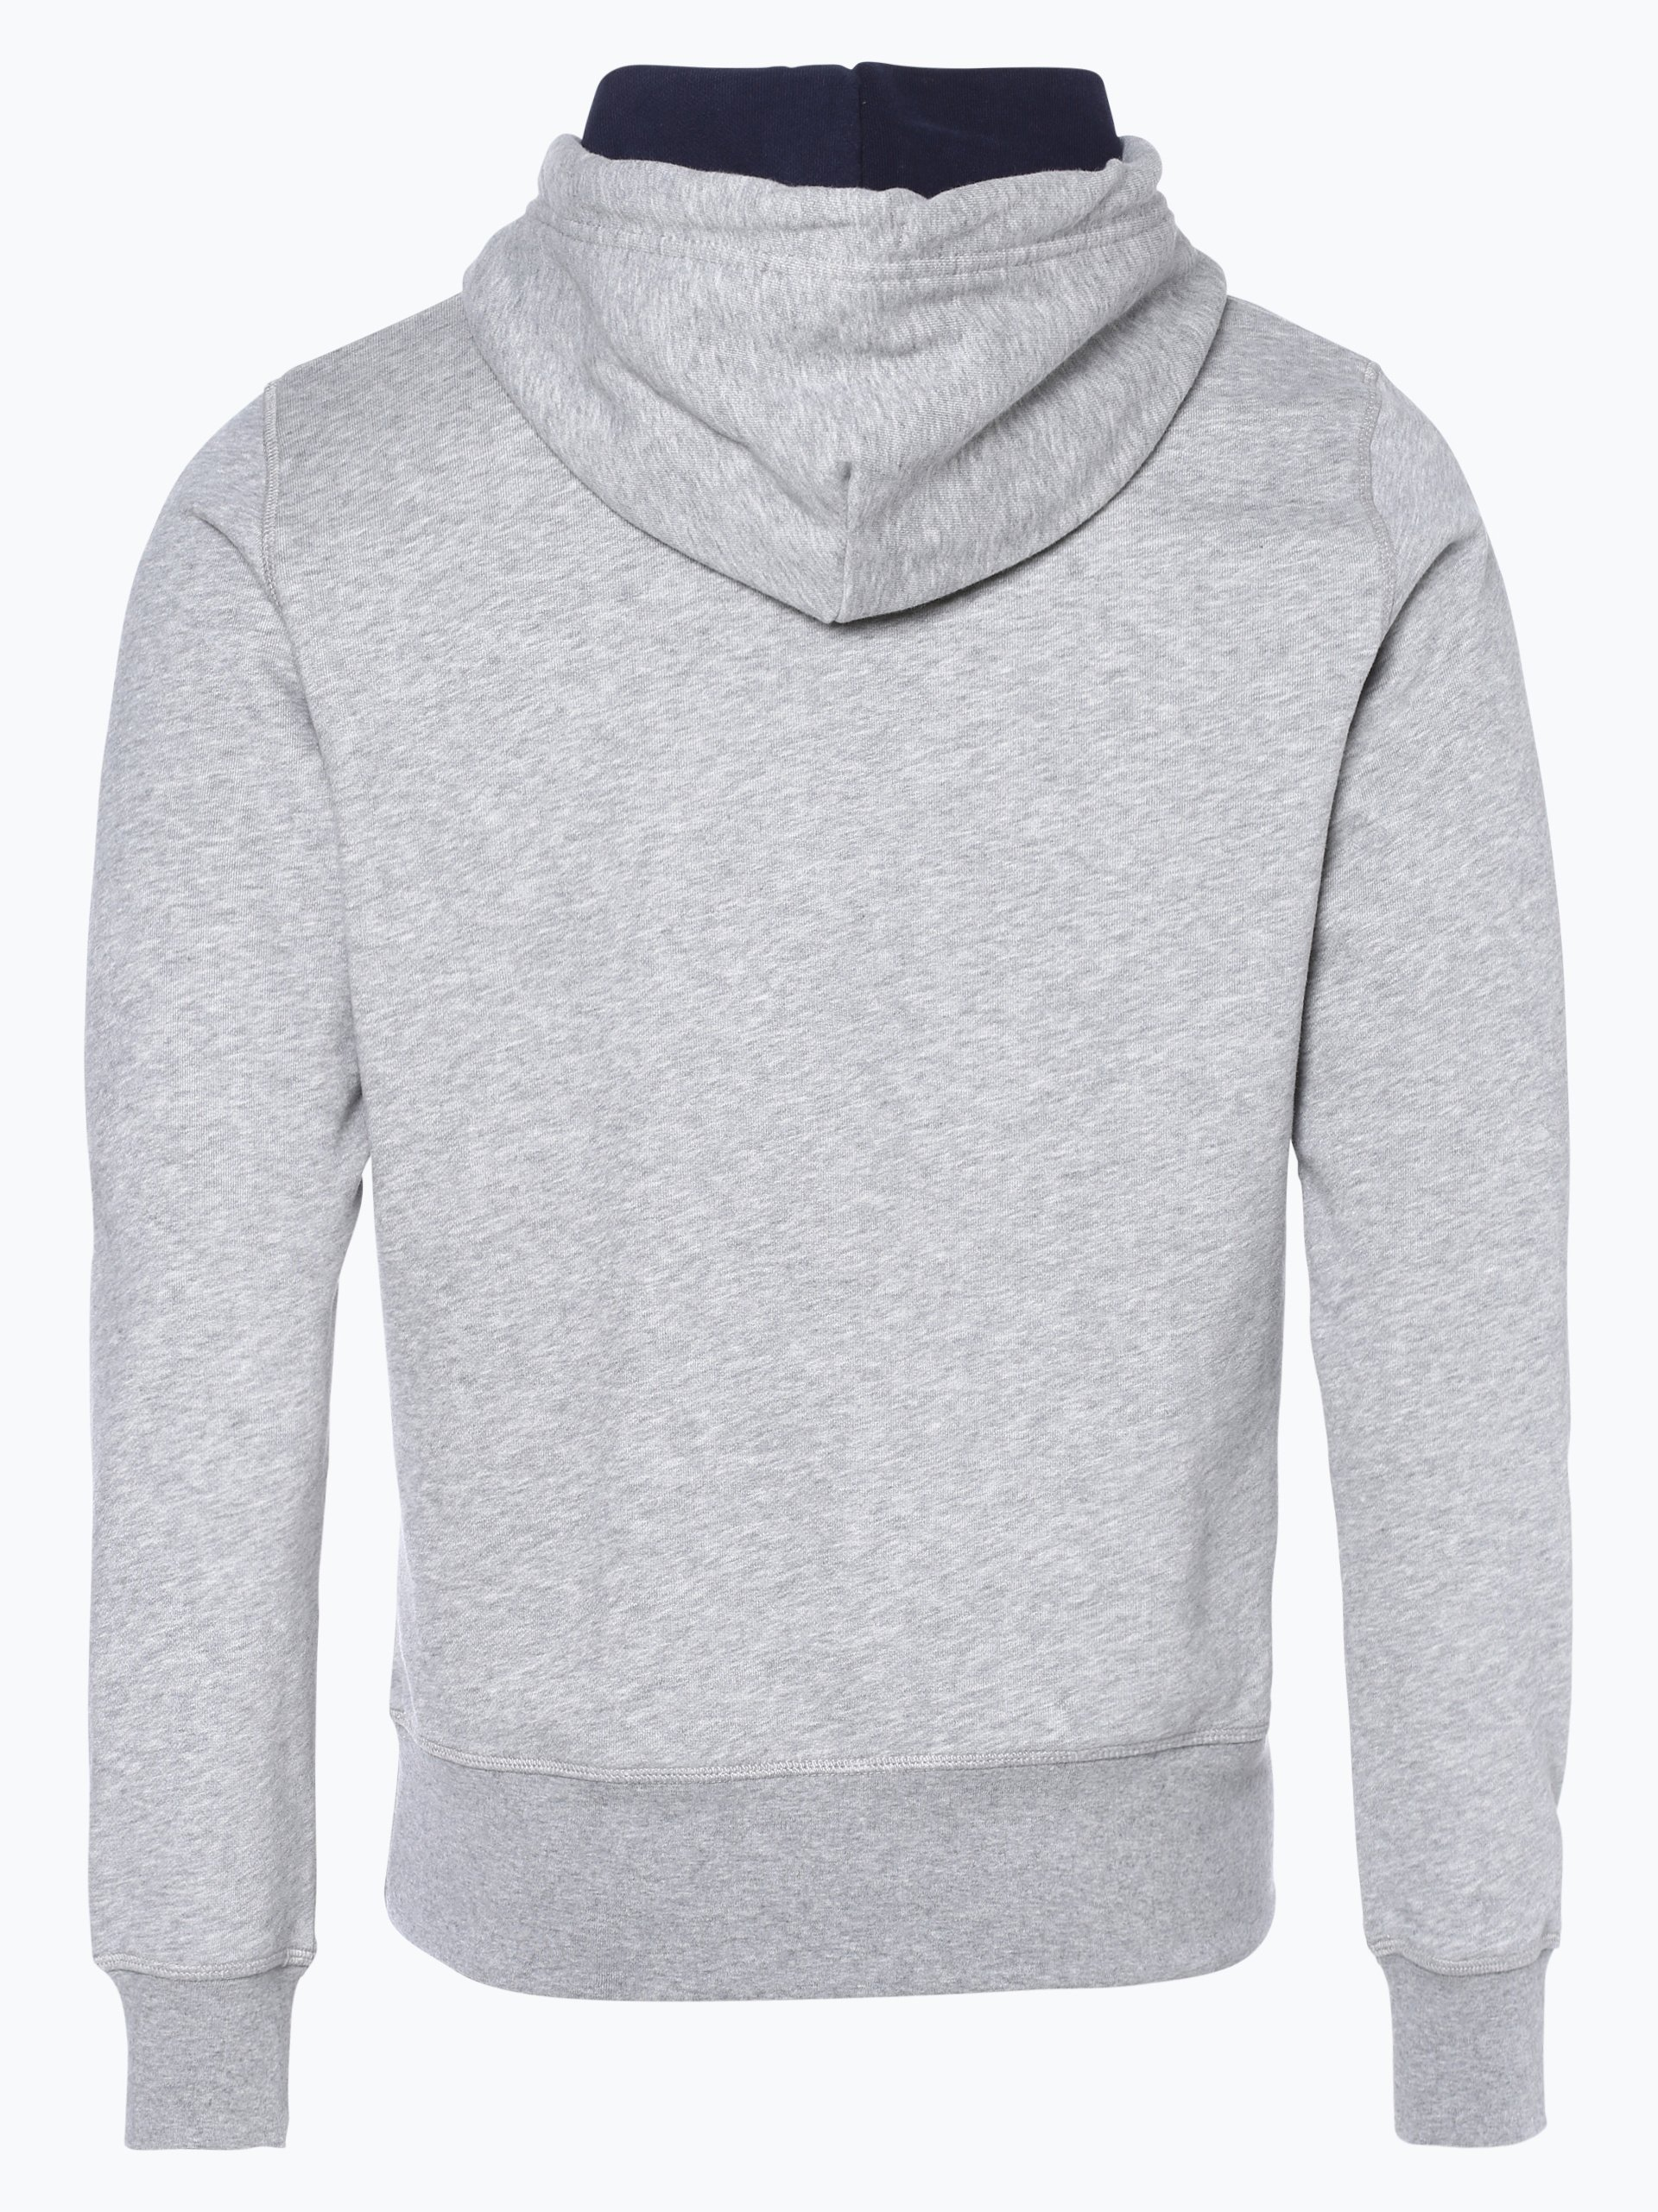 gant herren sweatshirt grau gemustert online kaufen peek. Black Bedroom Furniture Sets. Home Design Ideas